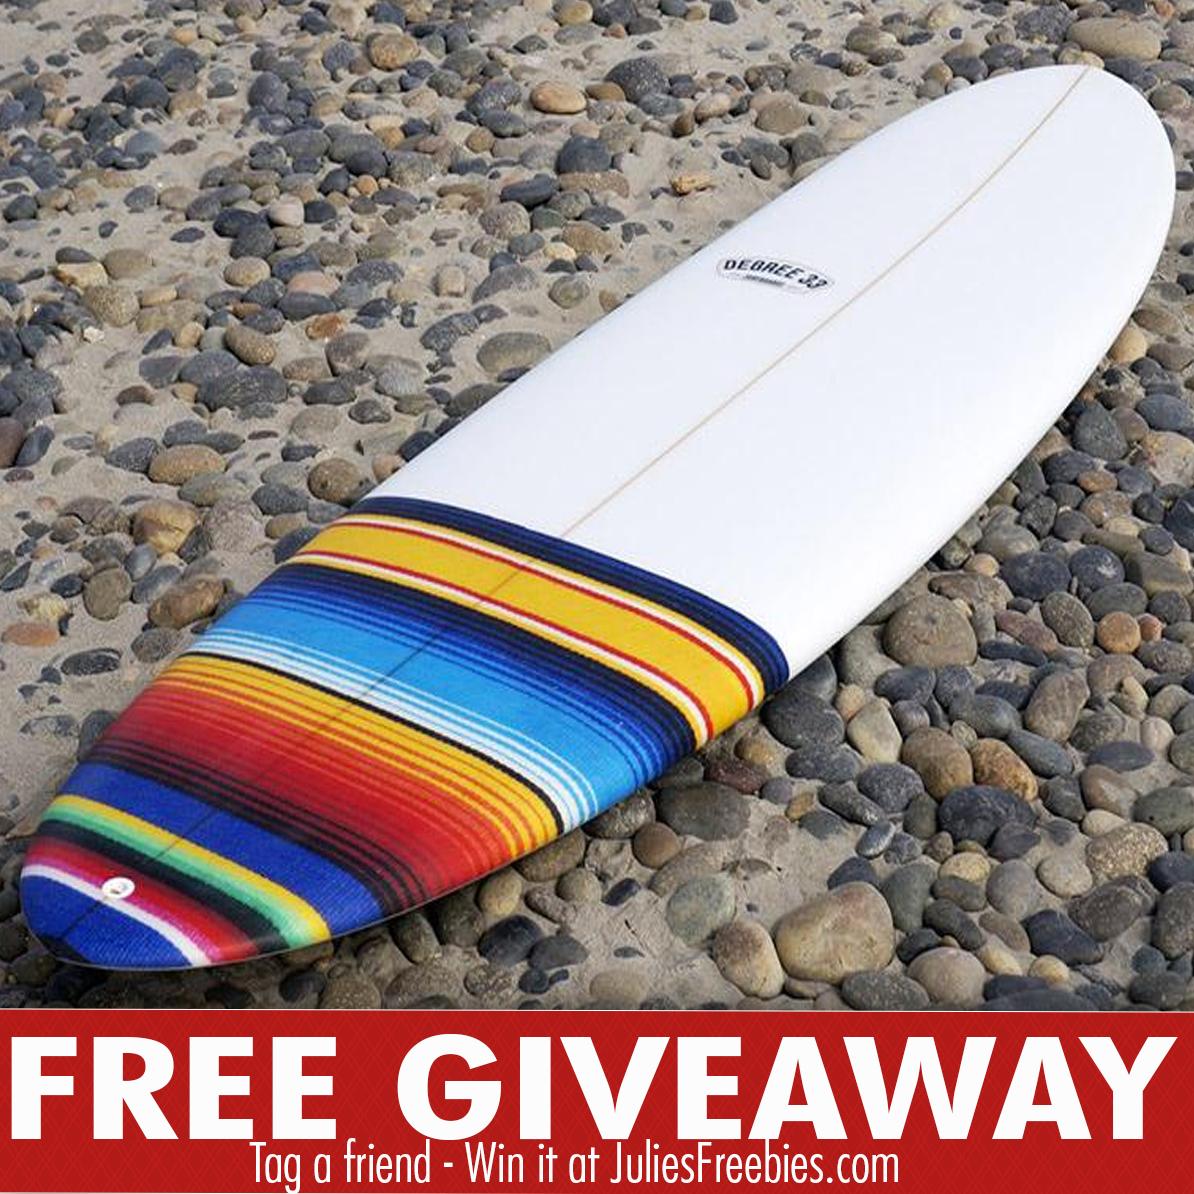 Degree 33 surfboard giveaways